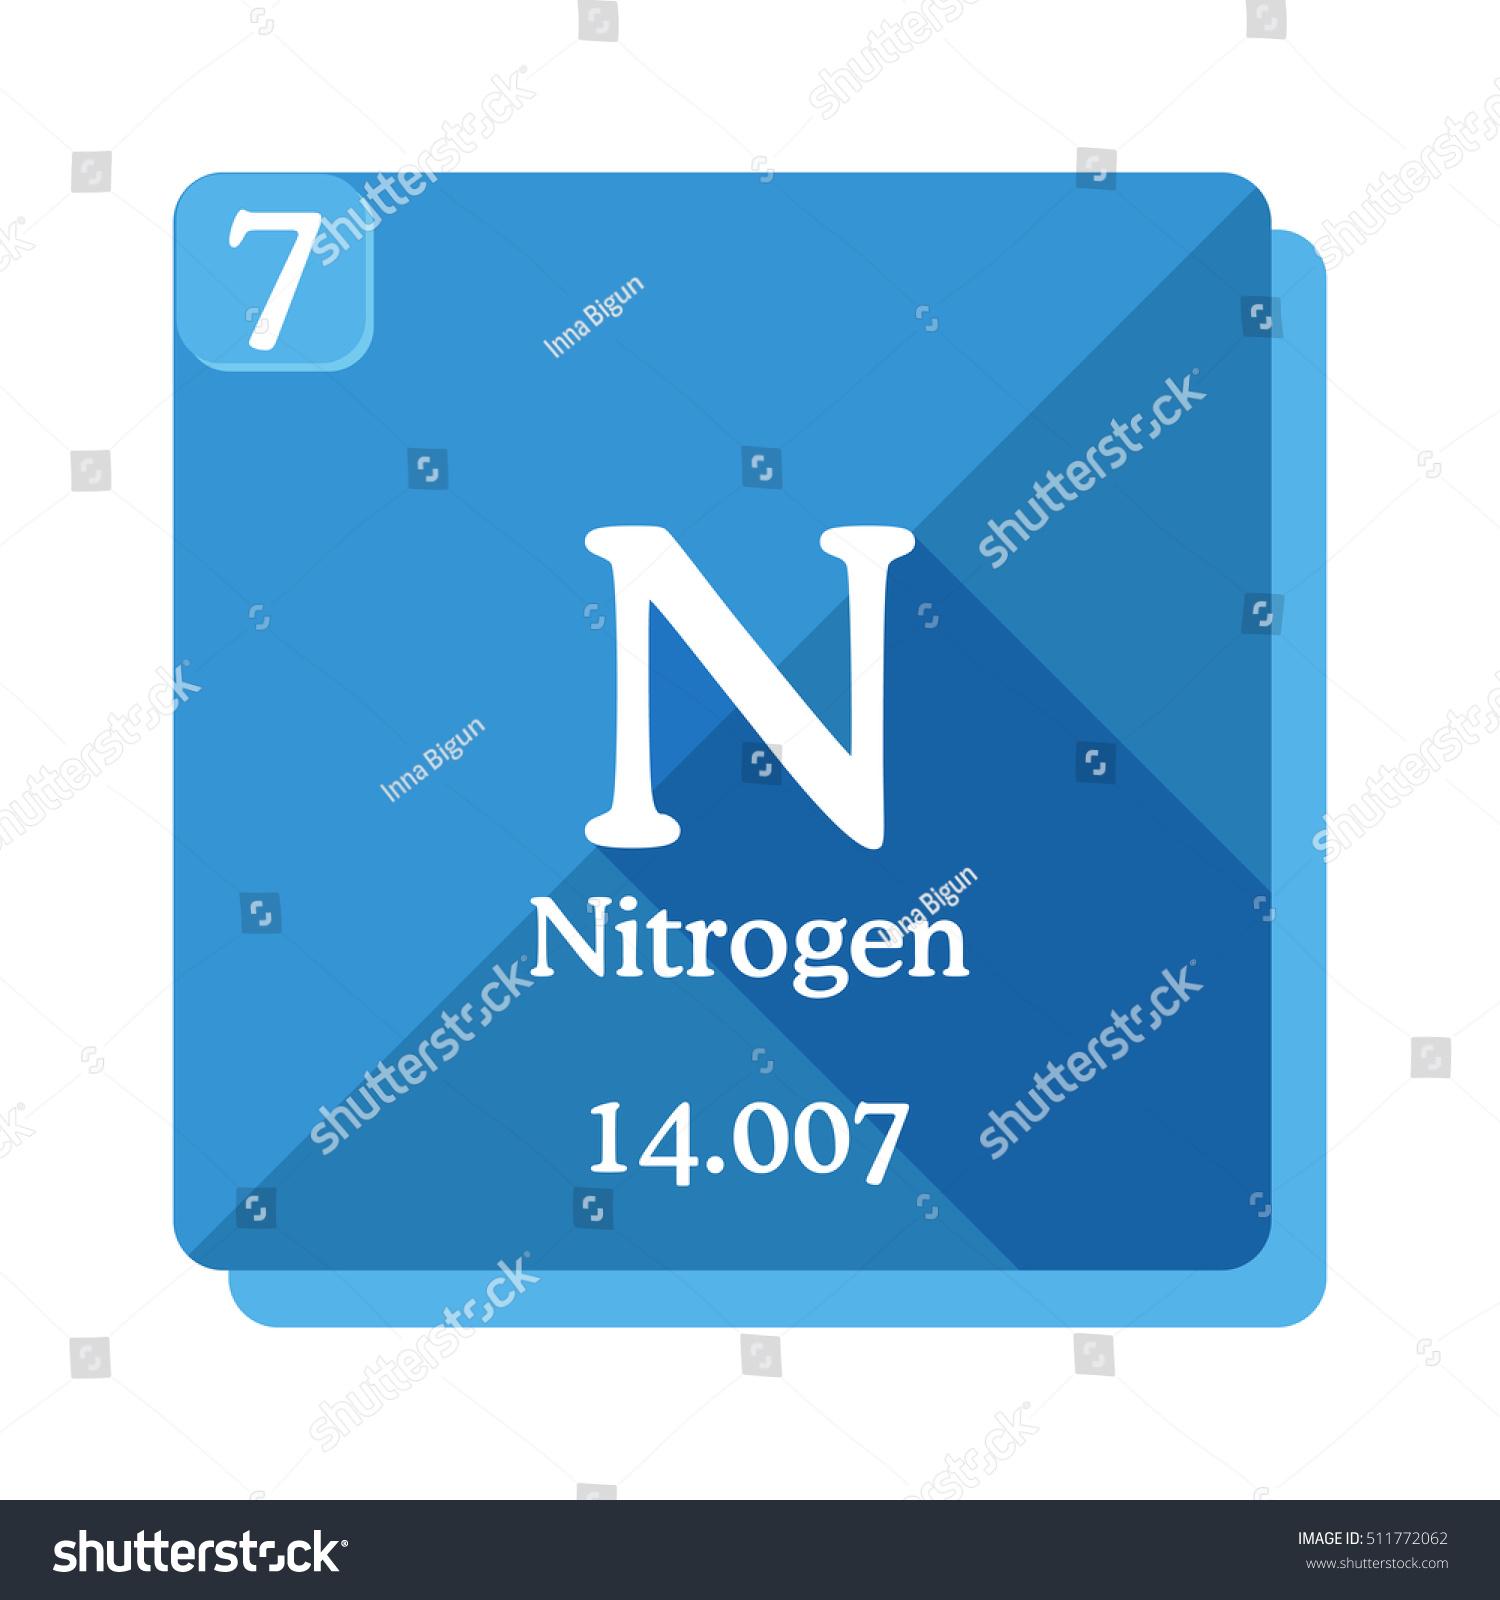 Nitrogen n element periodic table nitrogen stock vector 511772062 nitrogen n element of the periodic table nitrogen icon on blue background gamestrikefo Image collections